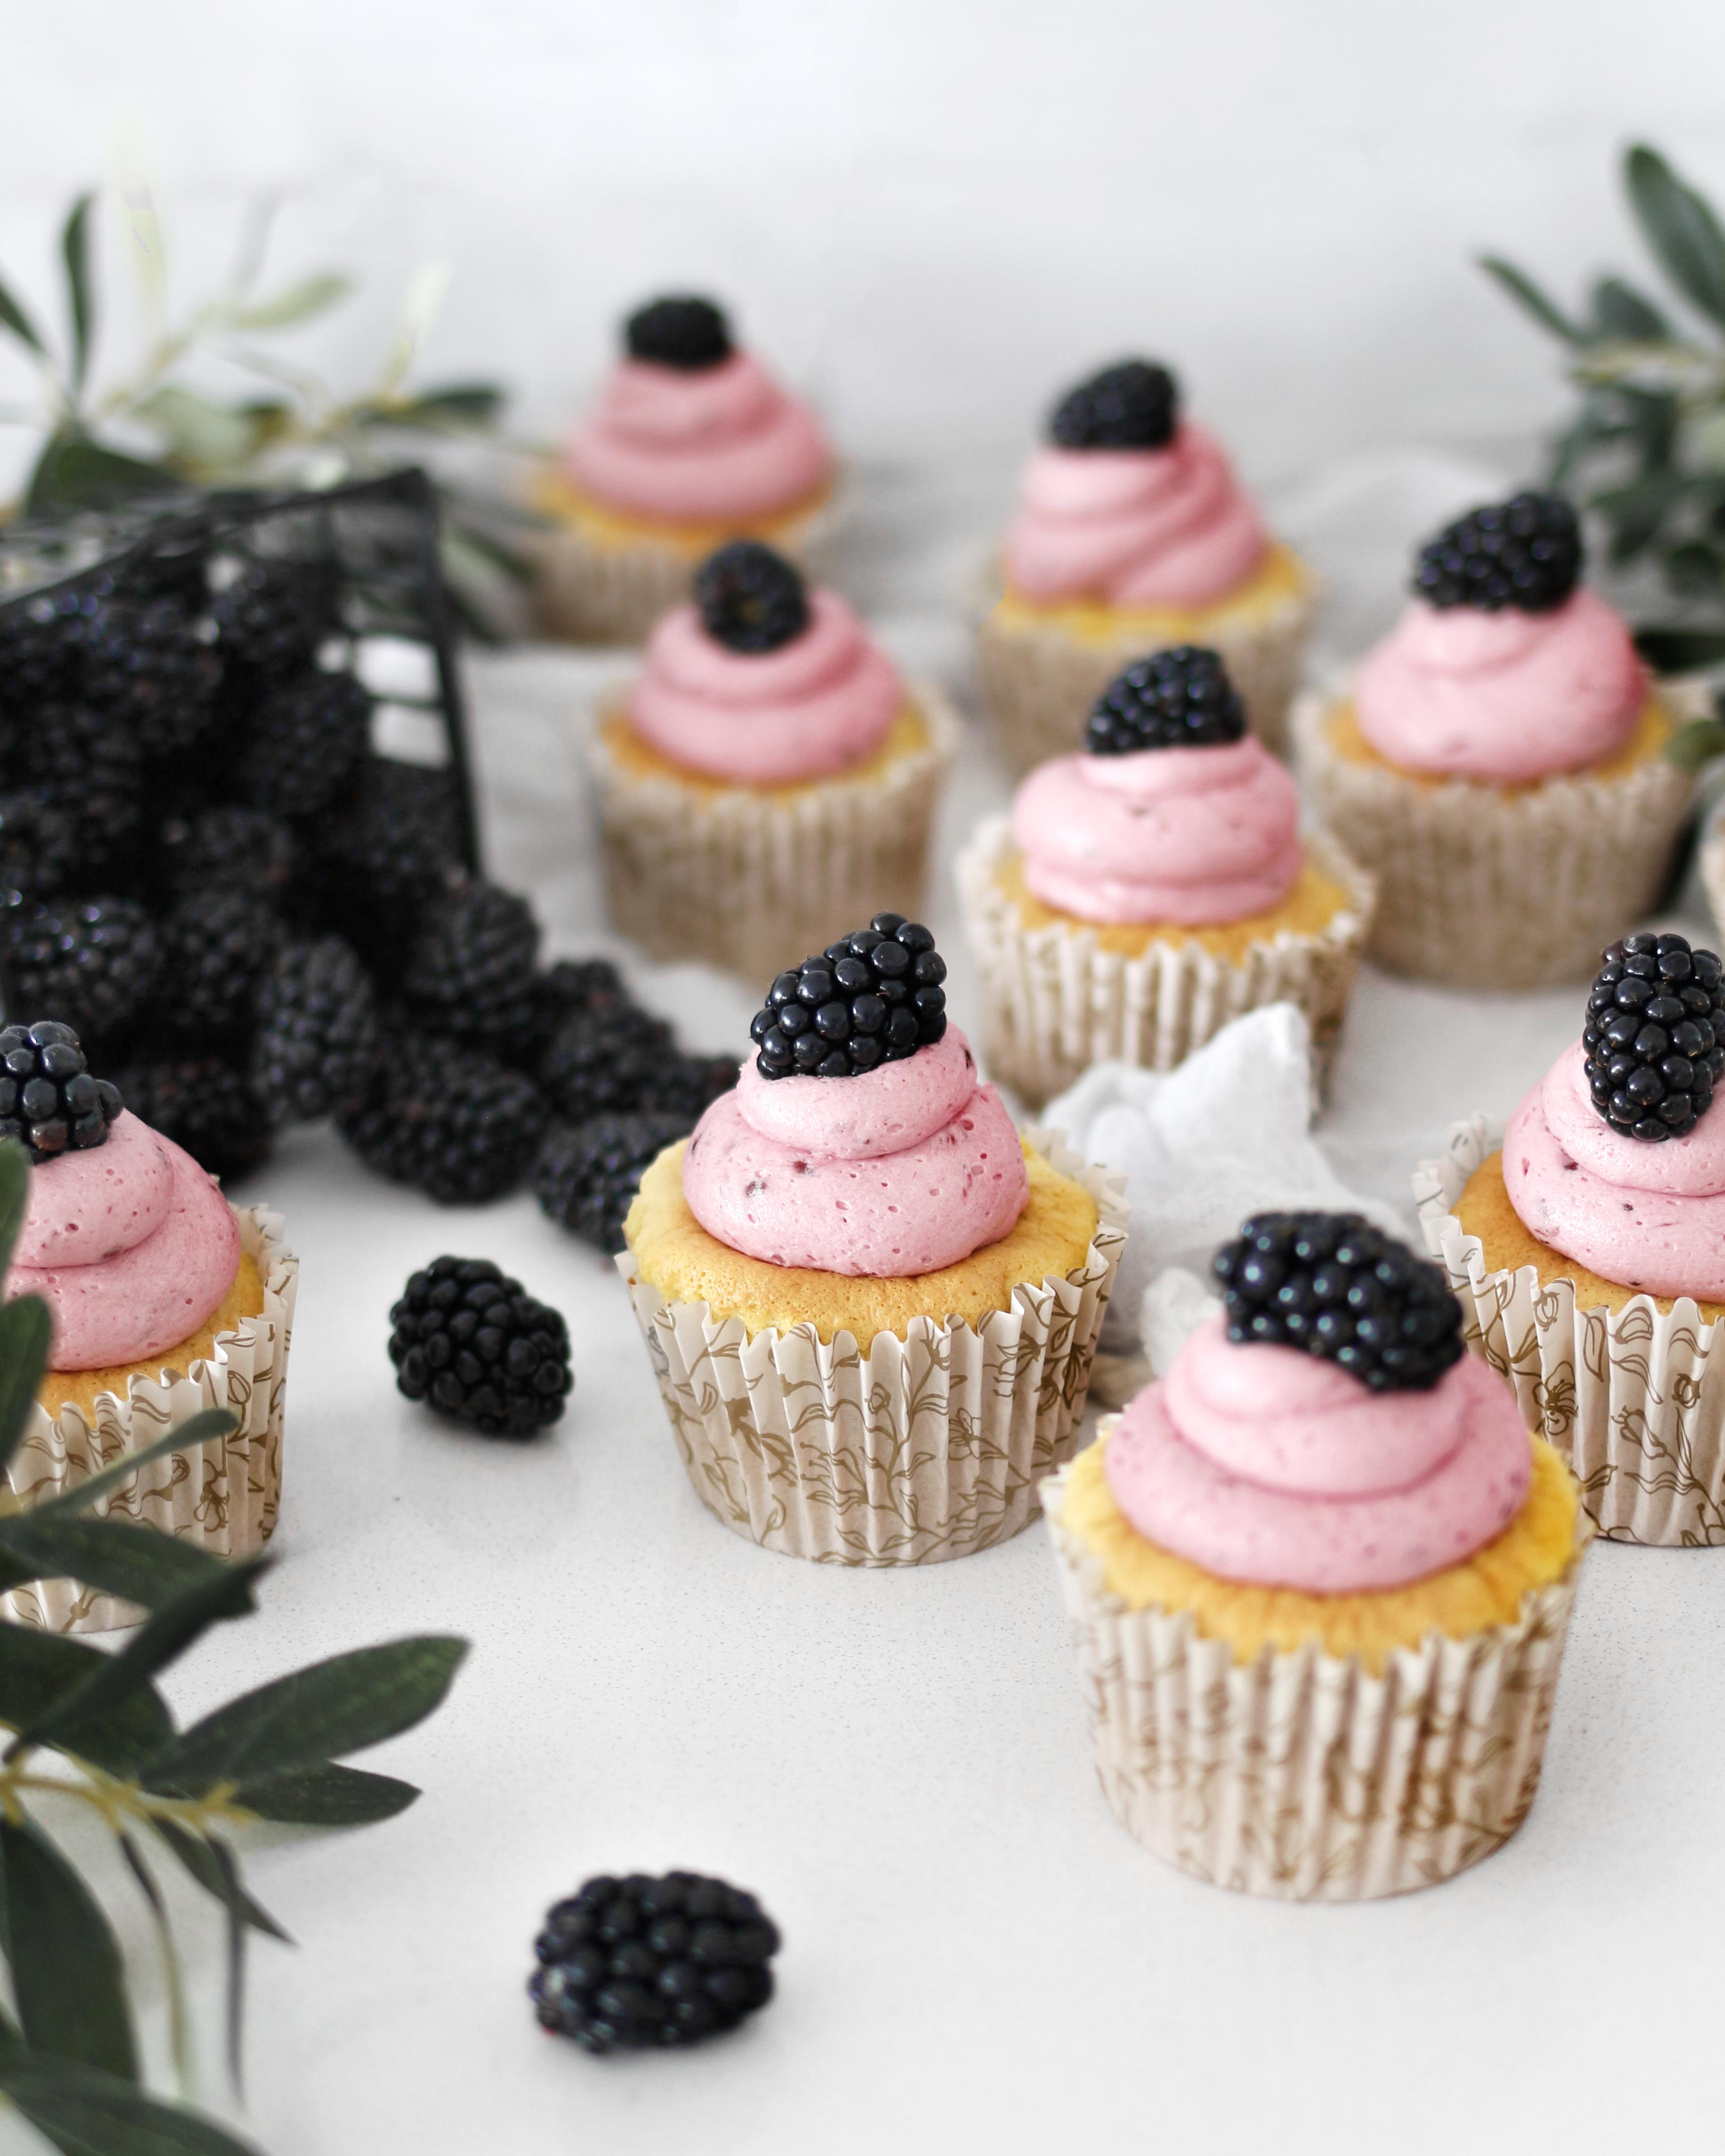 marsípan bollakökur cupcakes með silkimjúku brómberja smjörkremi